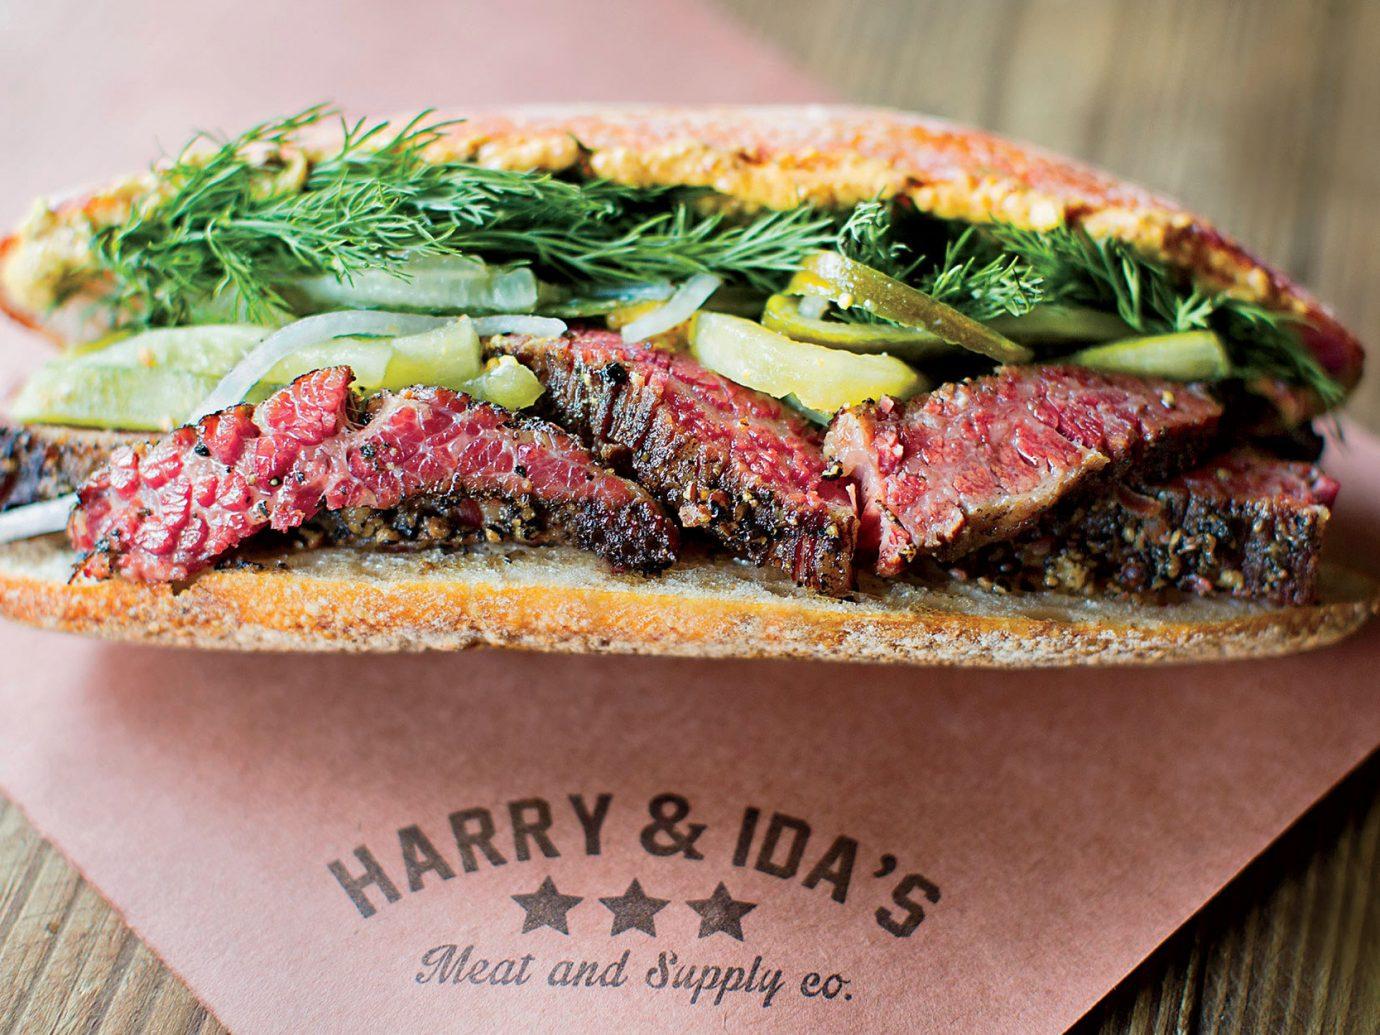 Food + Drink food dish produce meal sandwich snack food breakfast cuisine meat